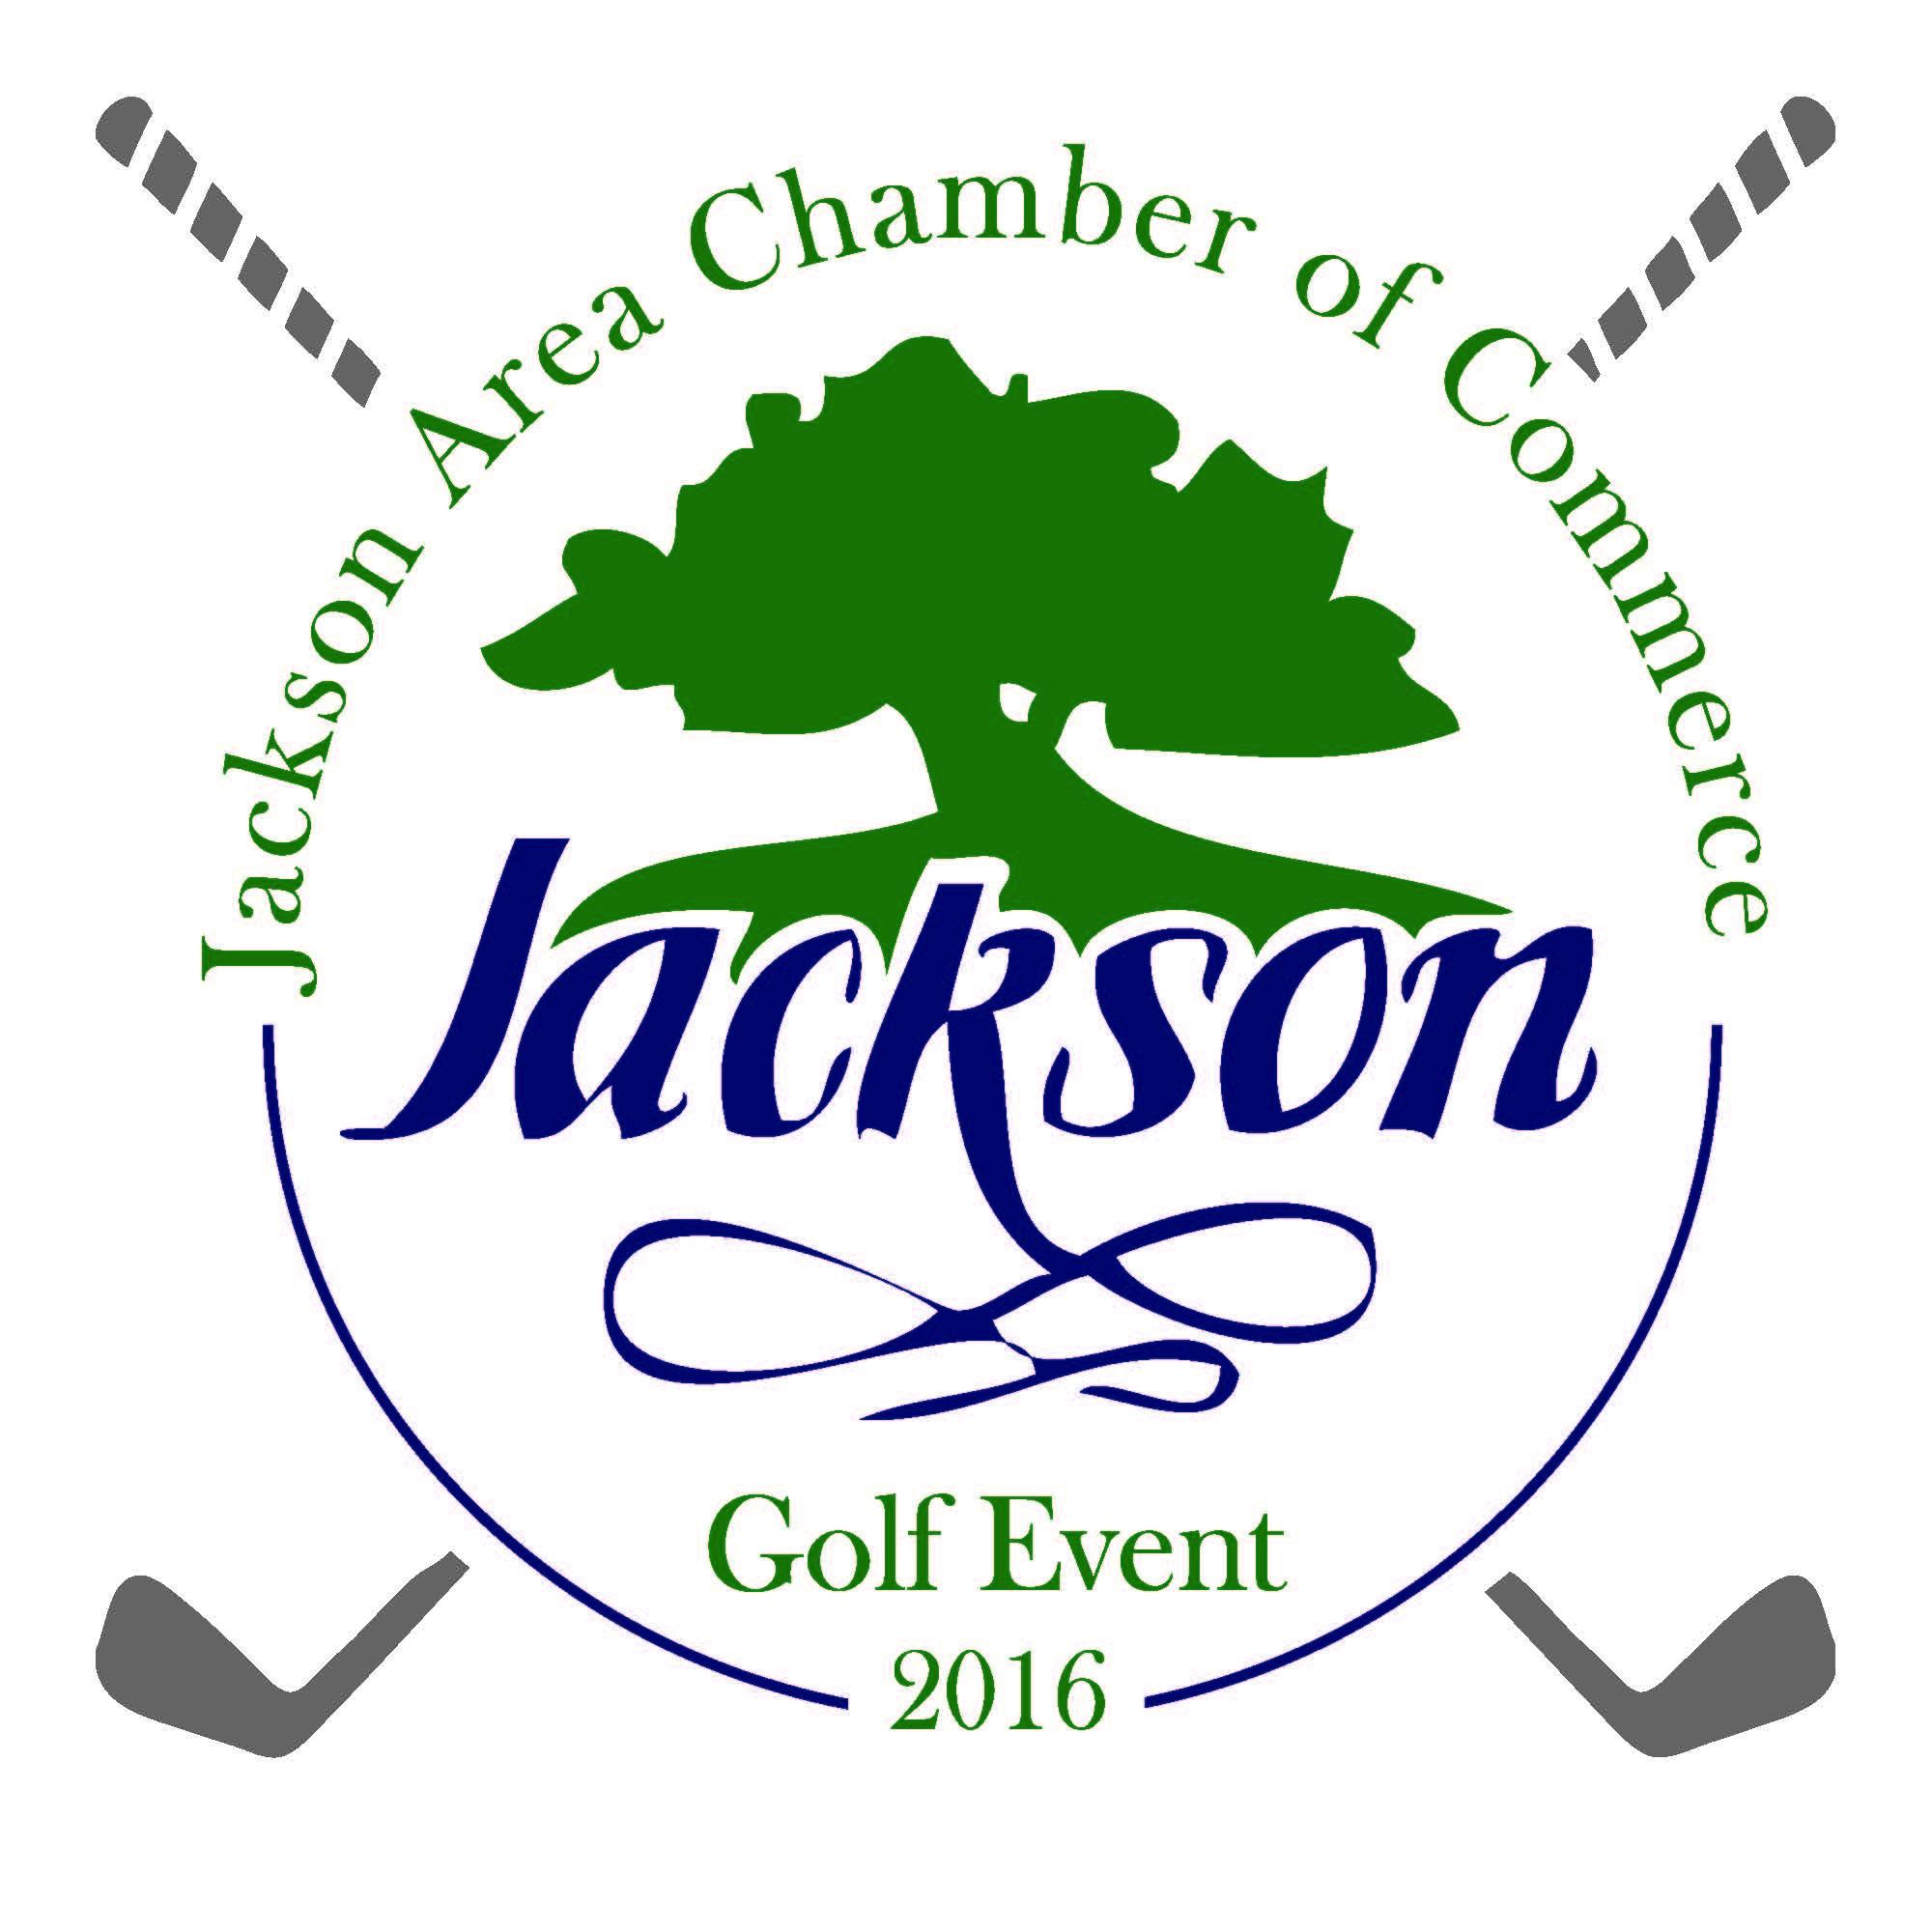 Jackson_Chamber_Golf_Logo_2016.jpg